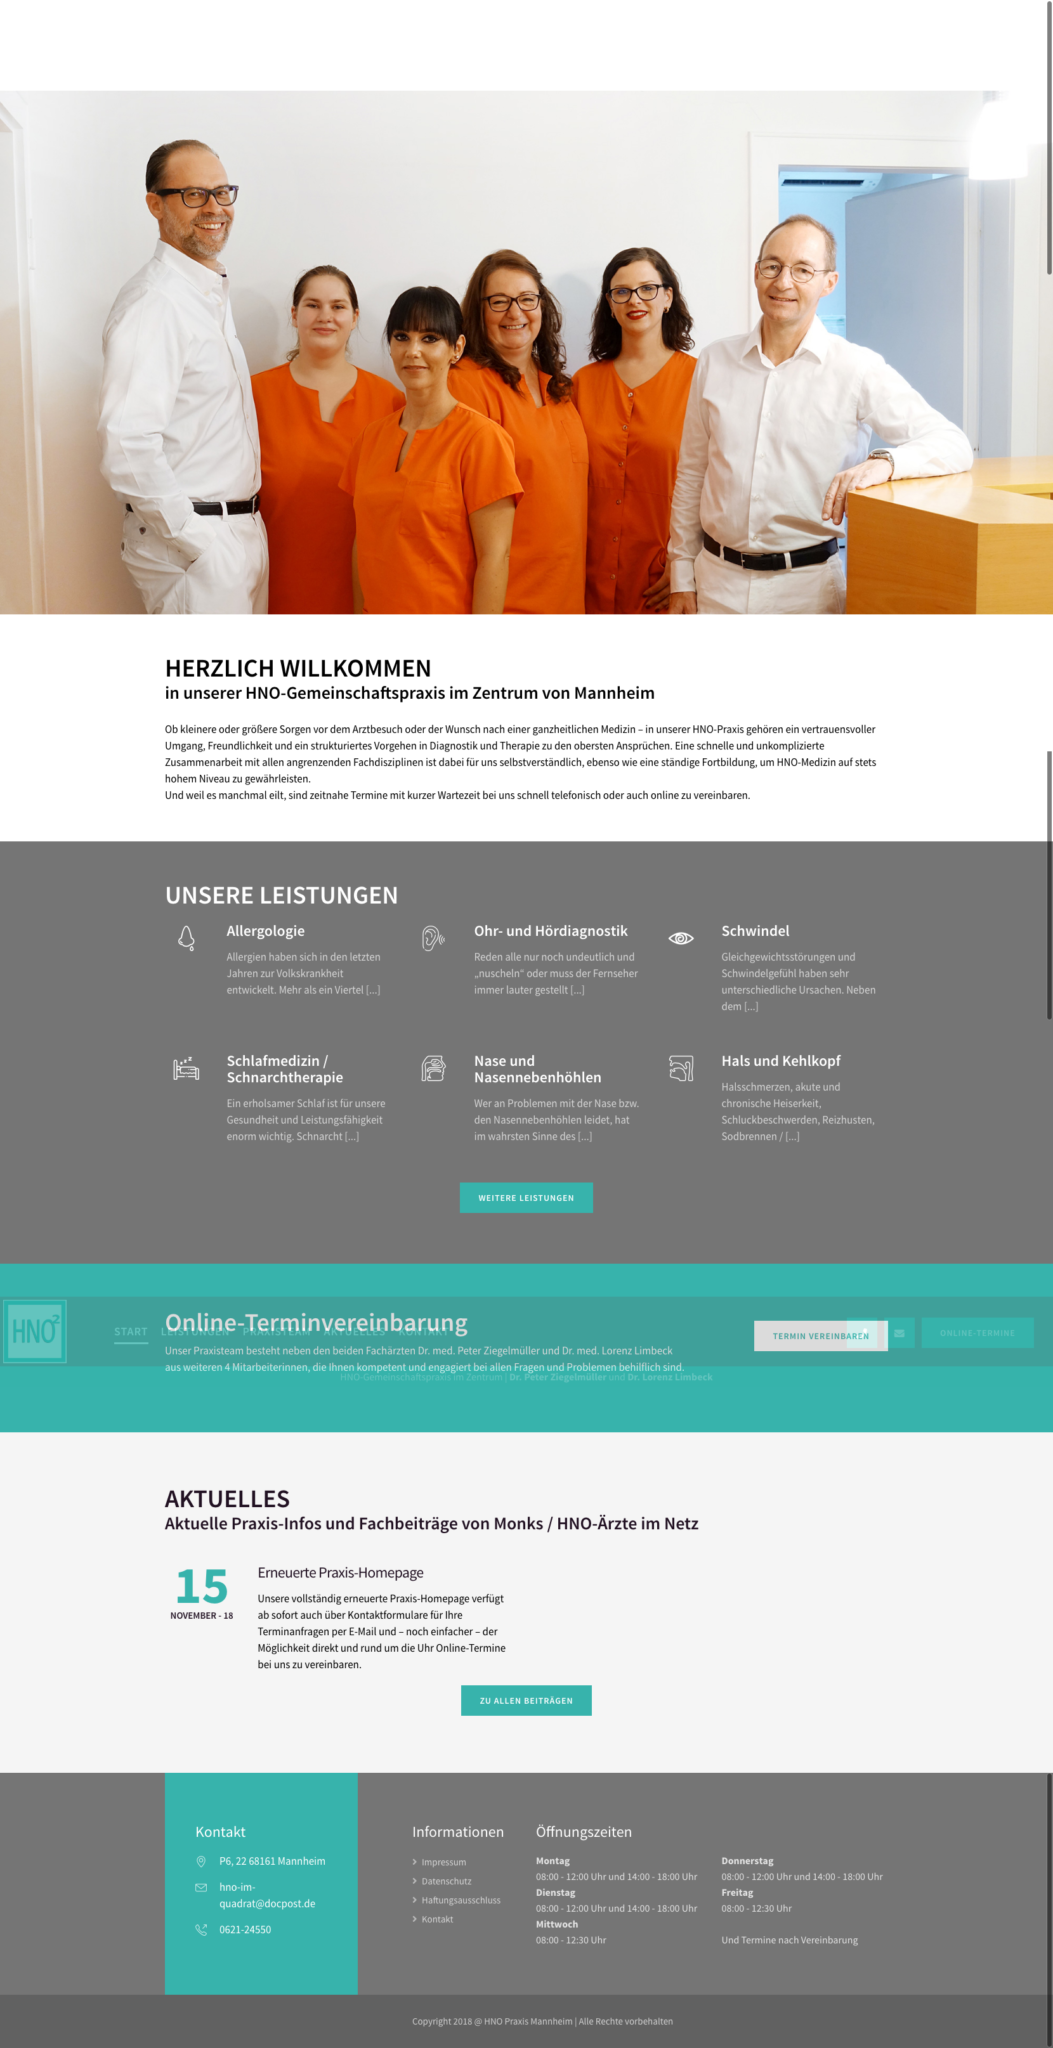 screenshot-hno-praxis-mannheim.de-2018.12.11-12-58-41 Relaunch der Präsenz HNO im Quadrat